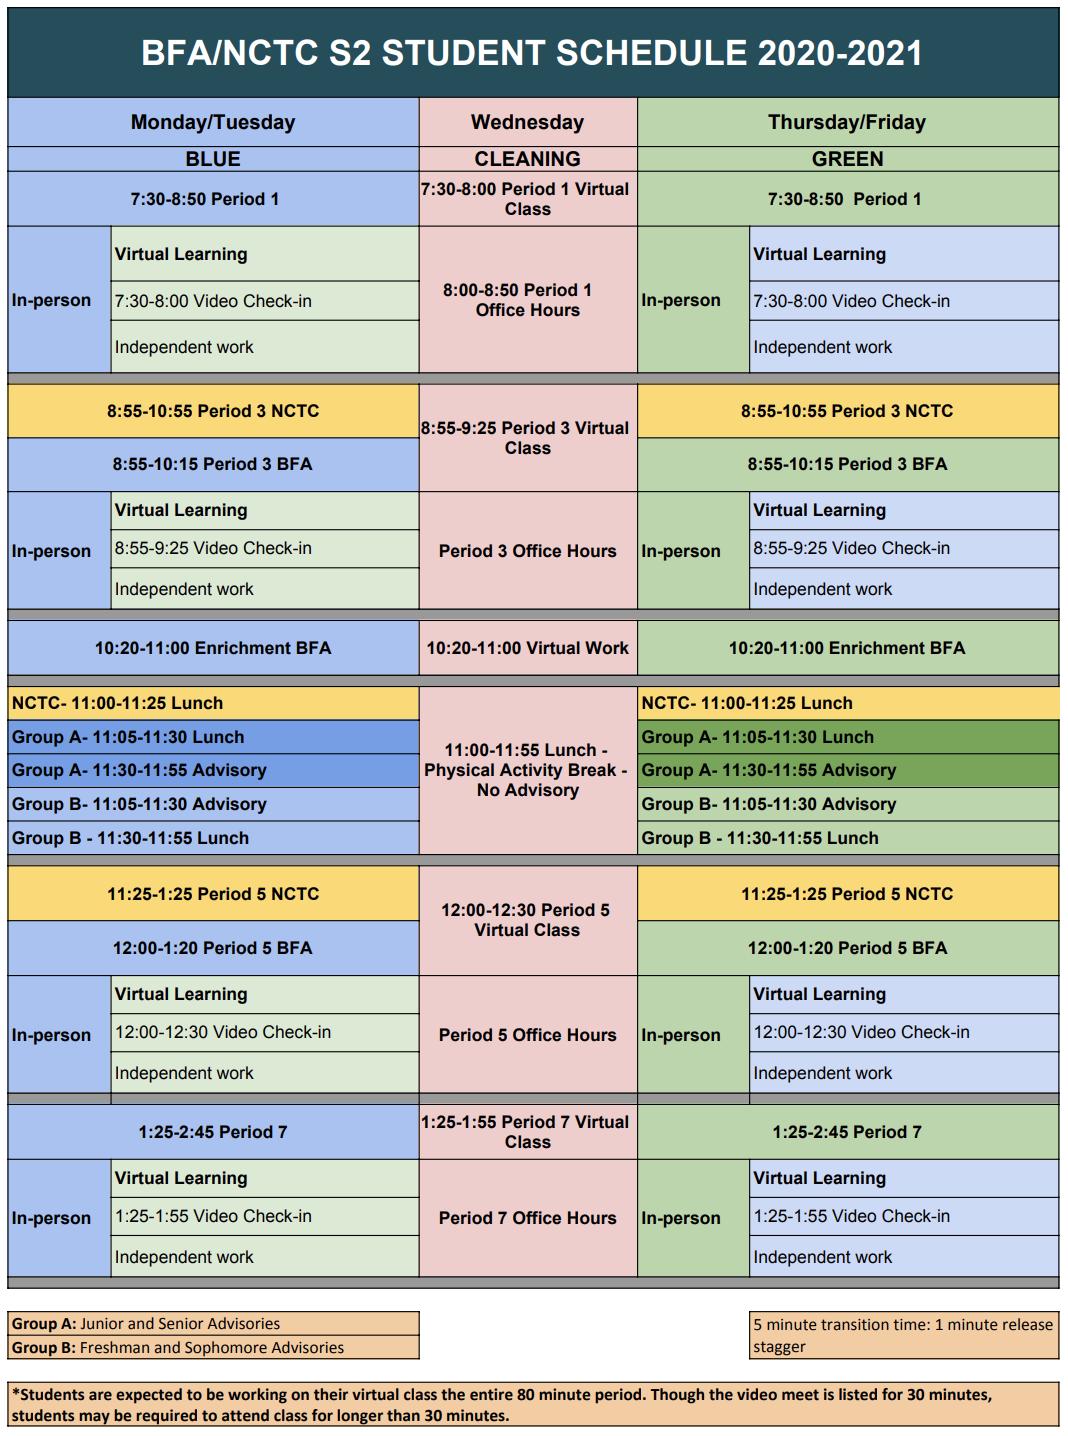 Semester 2 Student Schedule & Start Time